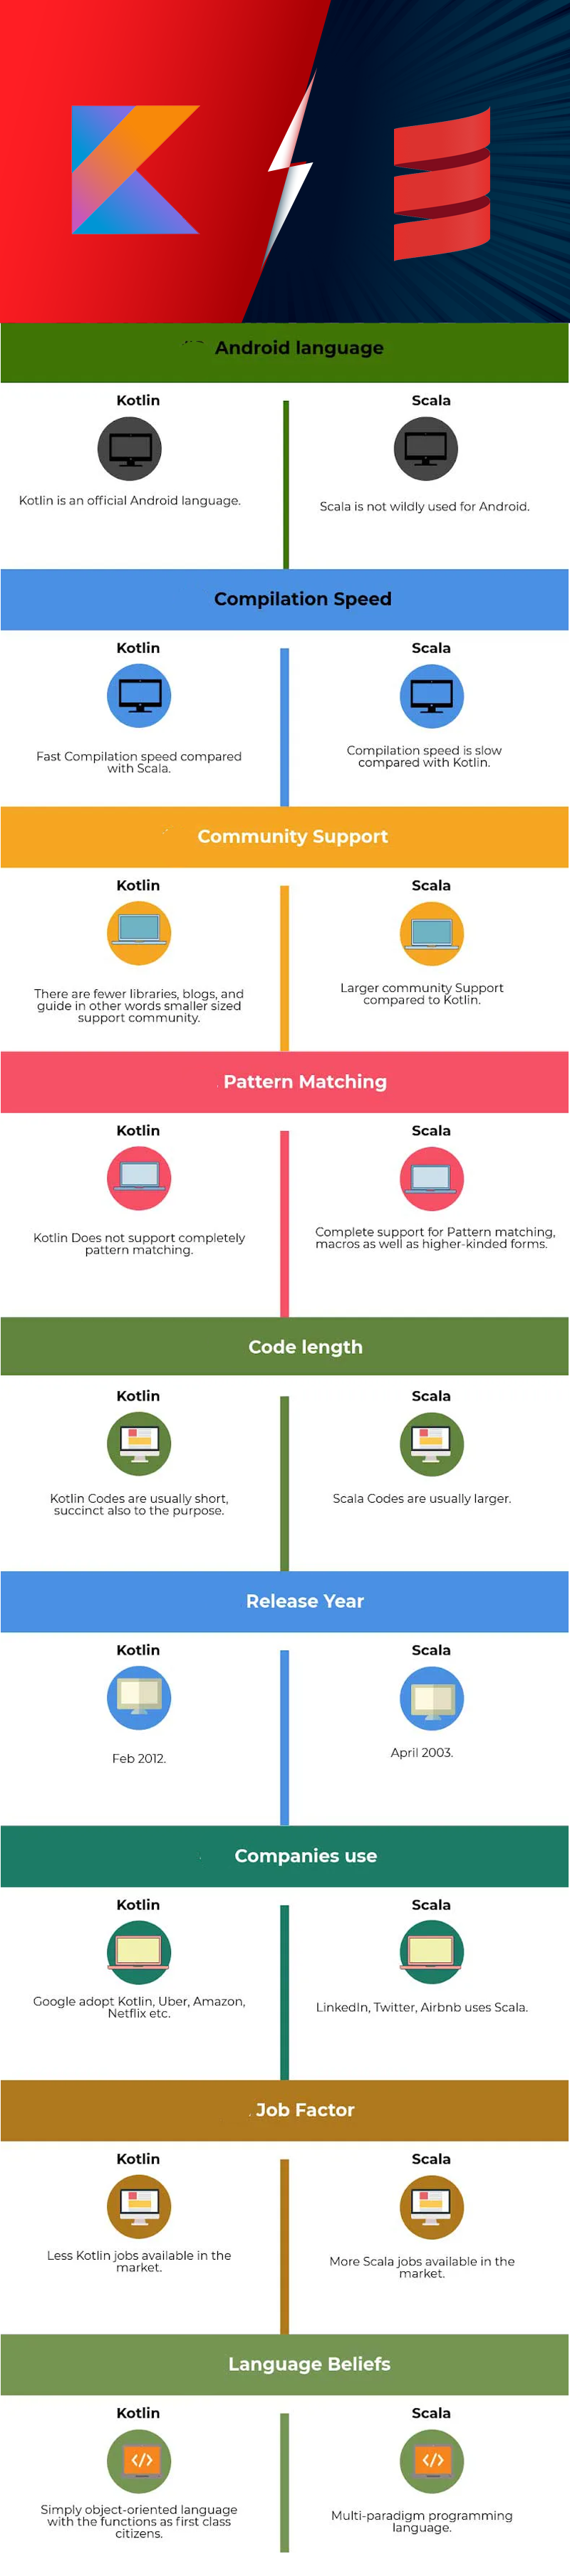 Kotlin Vs Scala: A Detailed Comparison